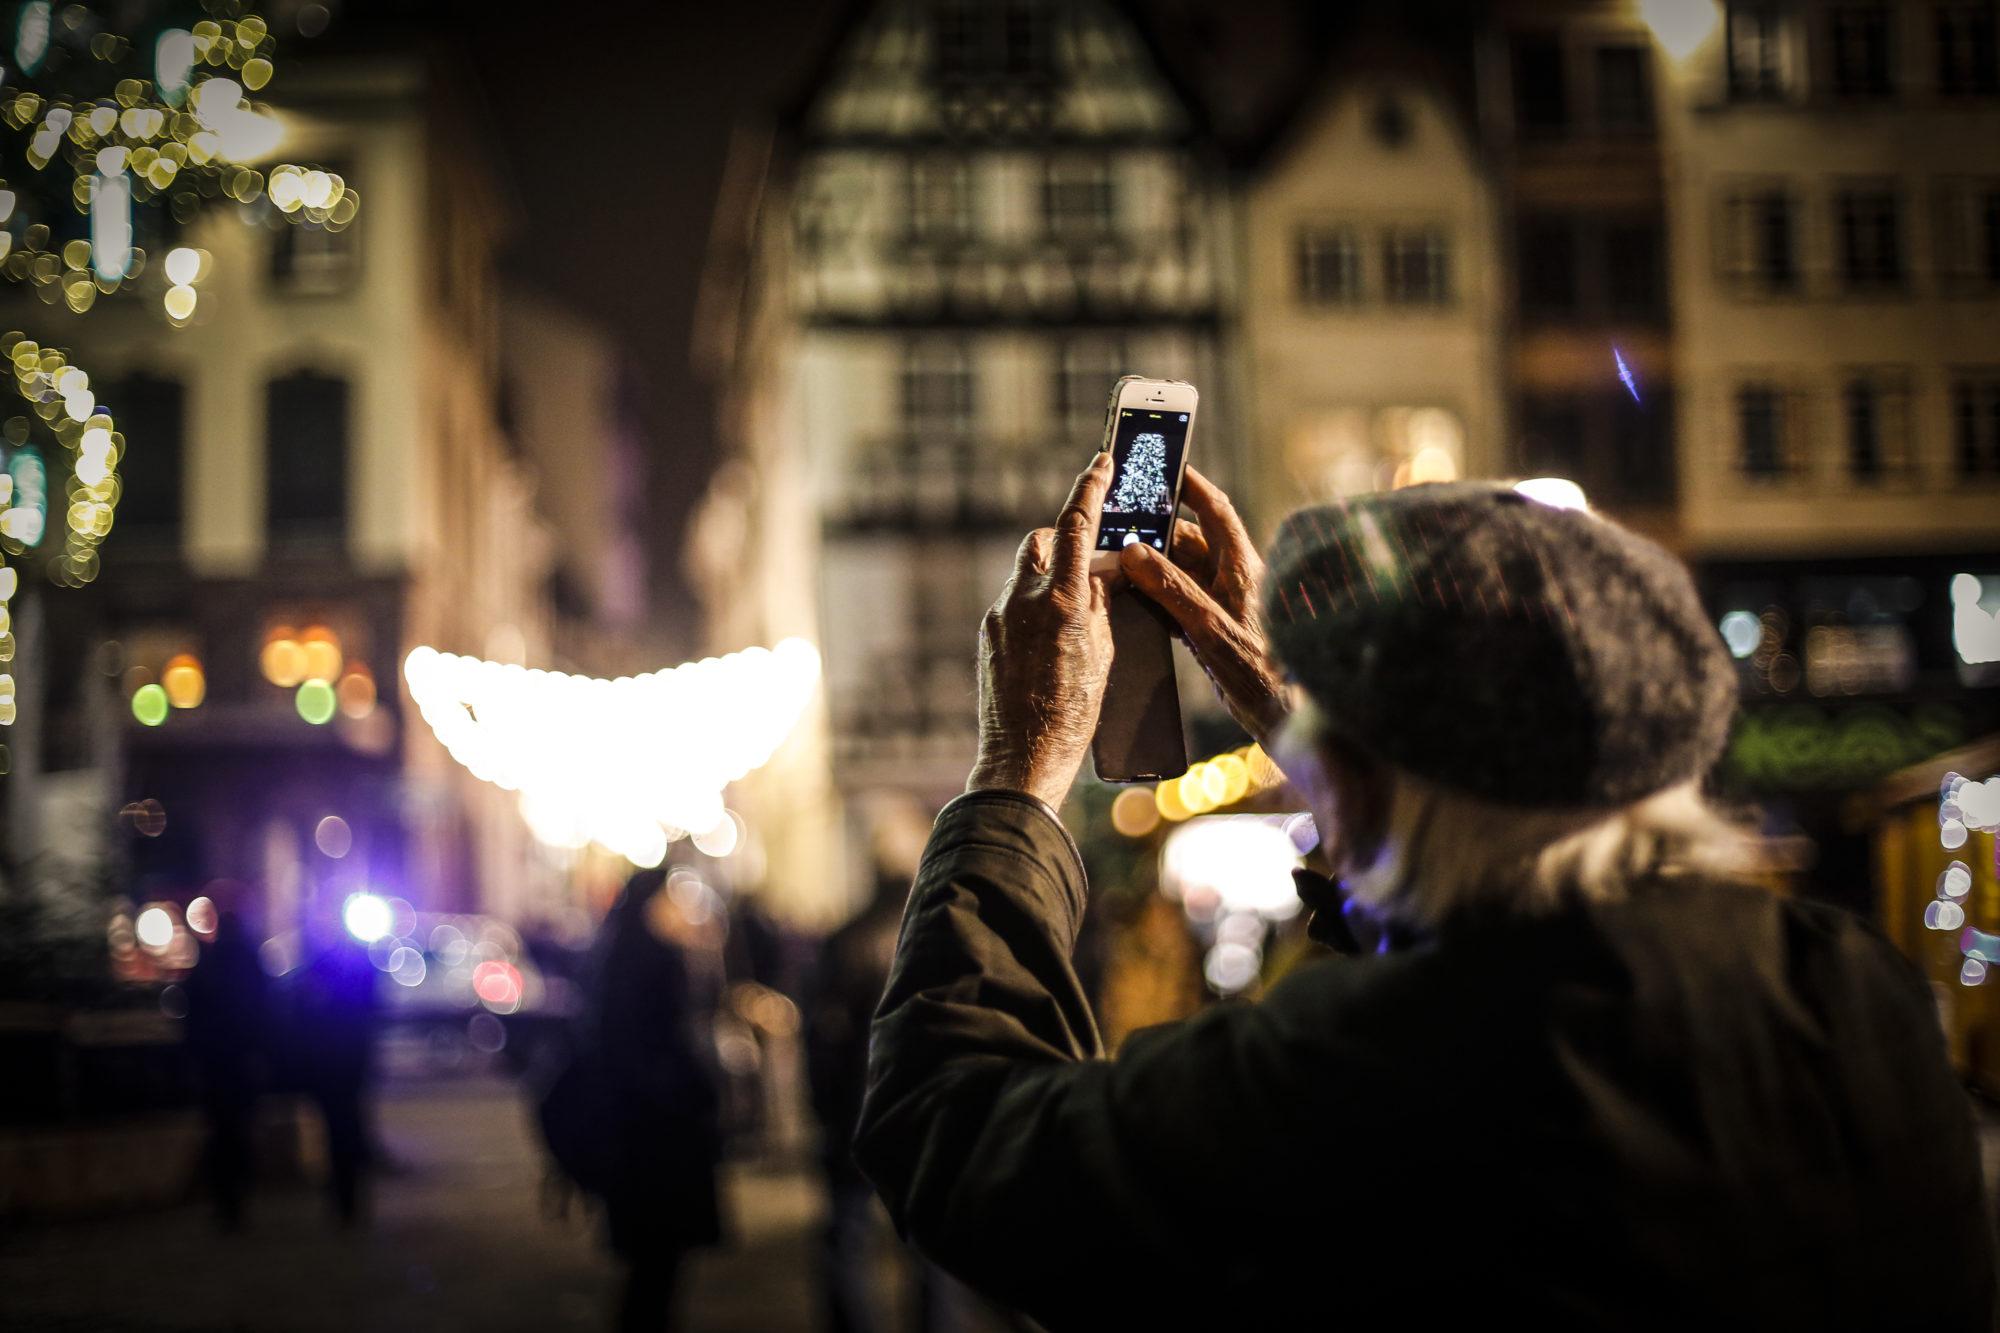 kasuma-streetphotography-travel-blog-strasbourg-christmas-2015-16